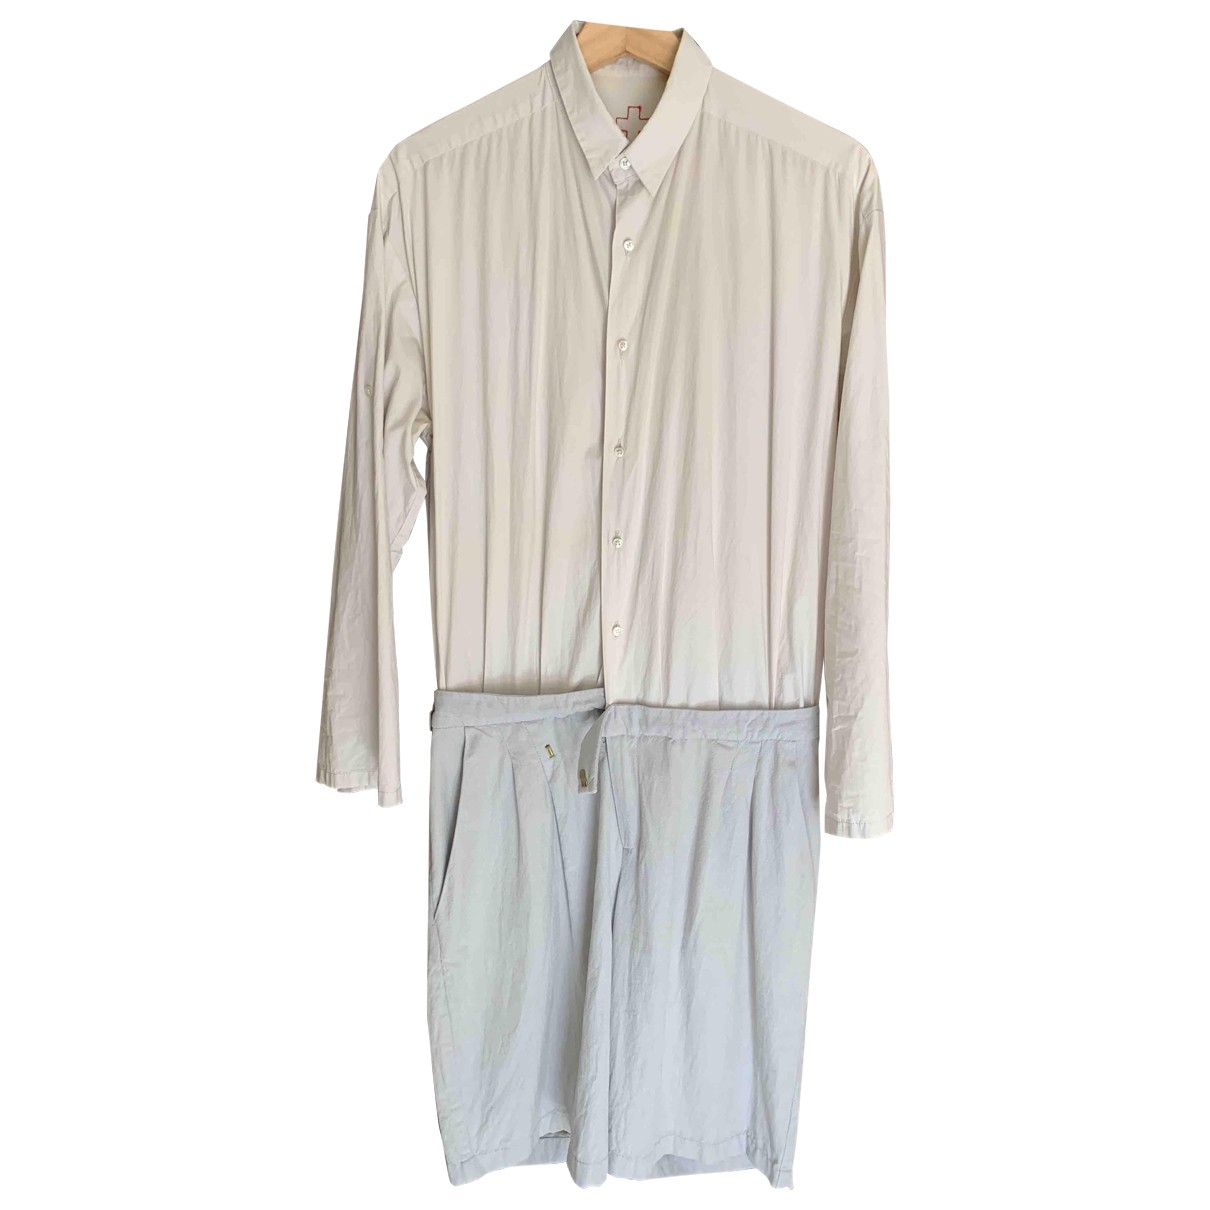 A.f.vandevorst \N Grey Cotton Shorts for Women S International